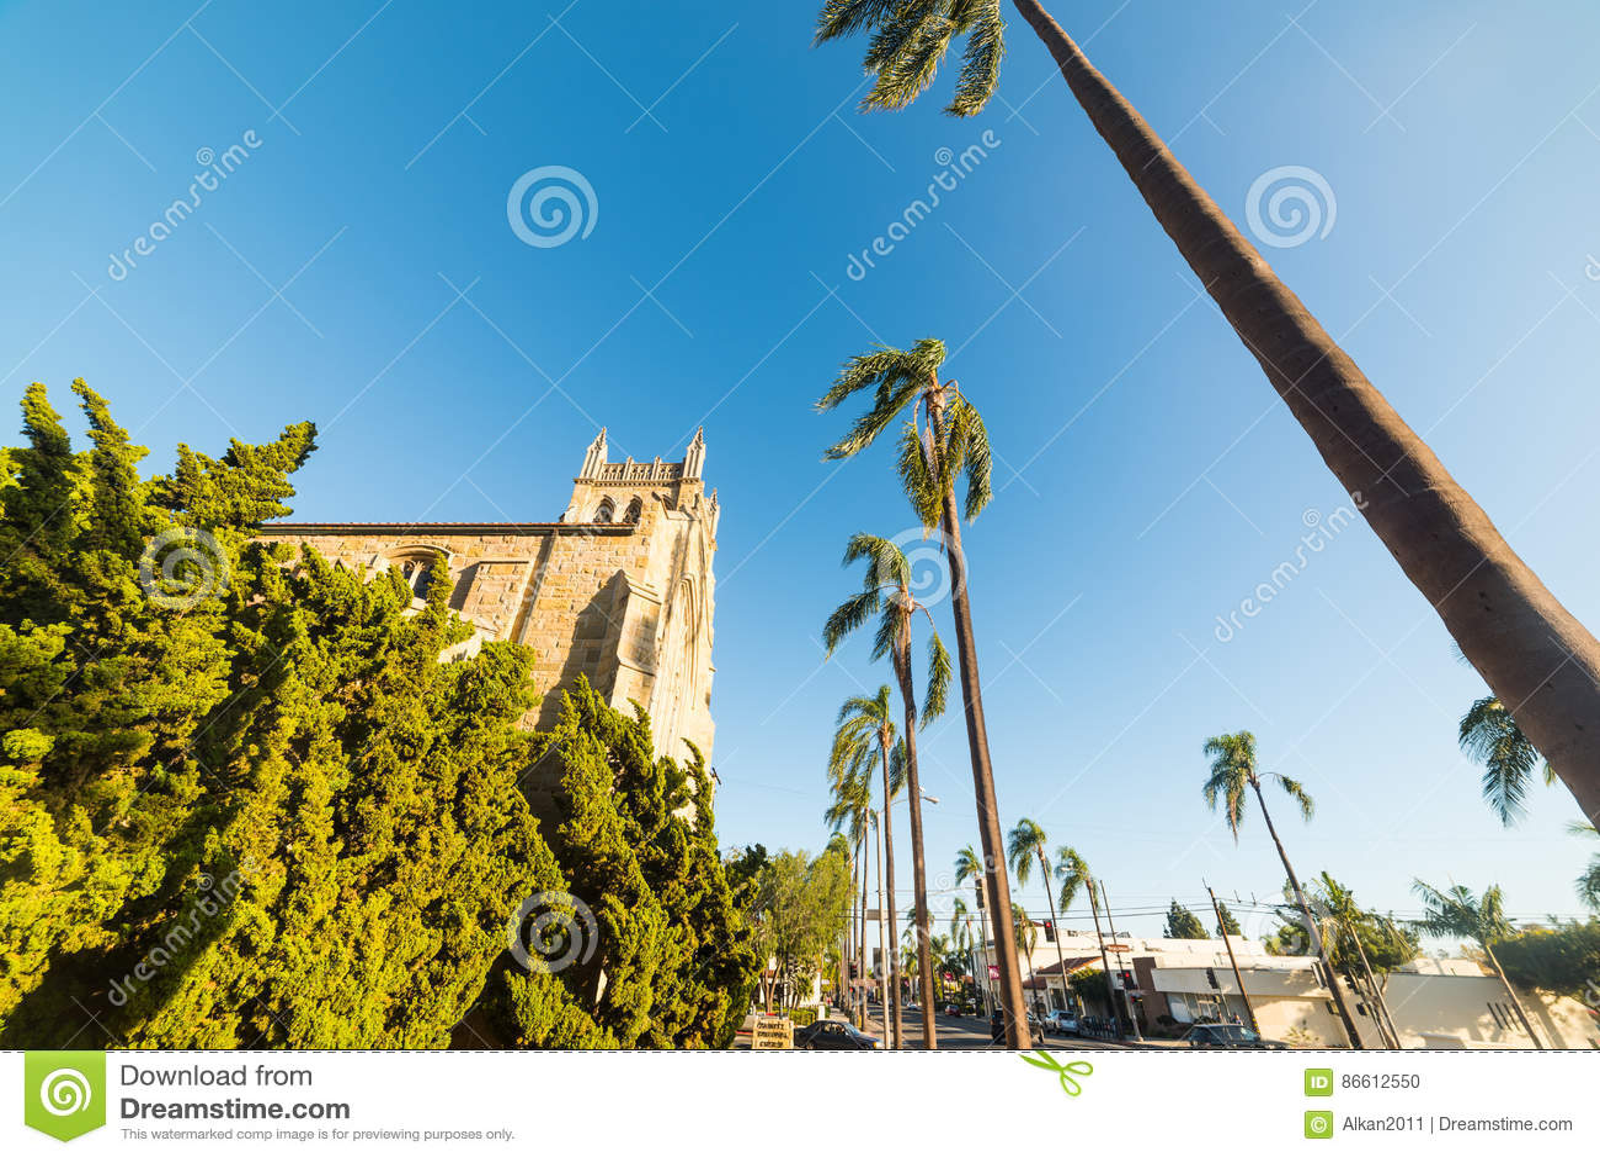 Nice Trinity Episcopal Church Santa Barbara #1: Santa-barbara-s-trinity-episcopal-church-california-86612550.jpg